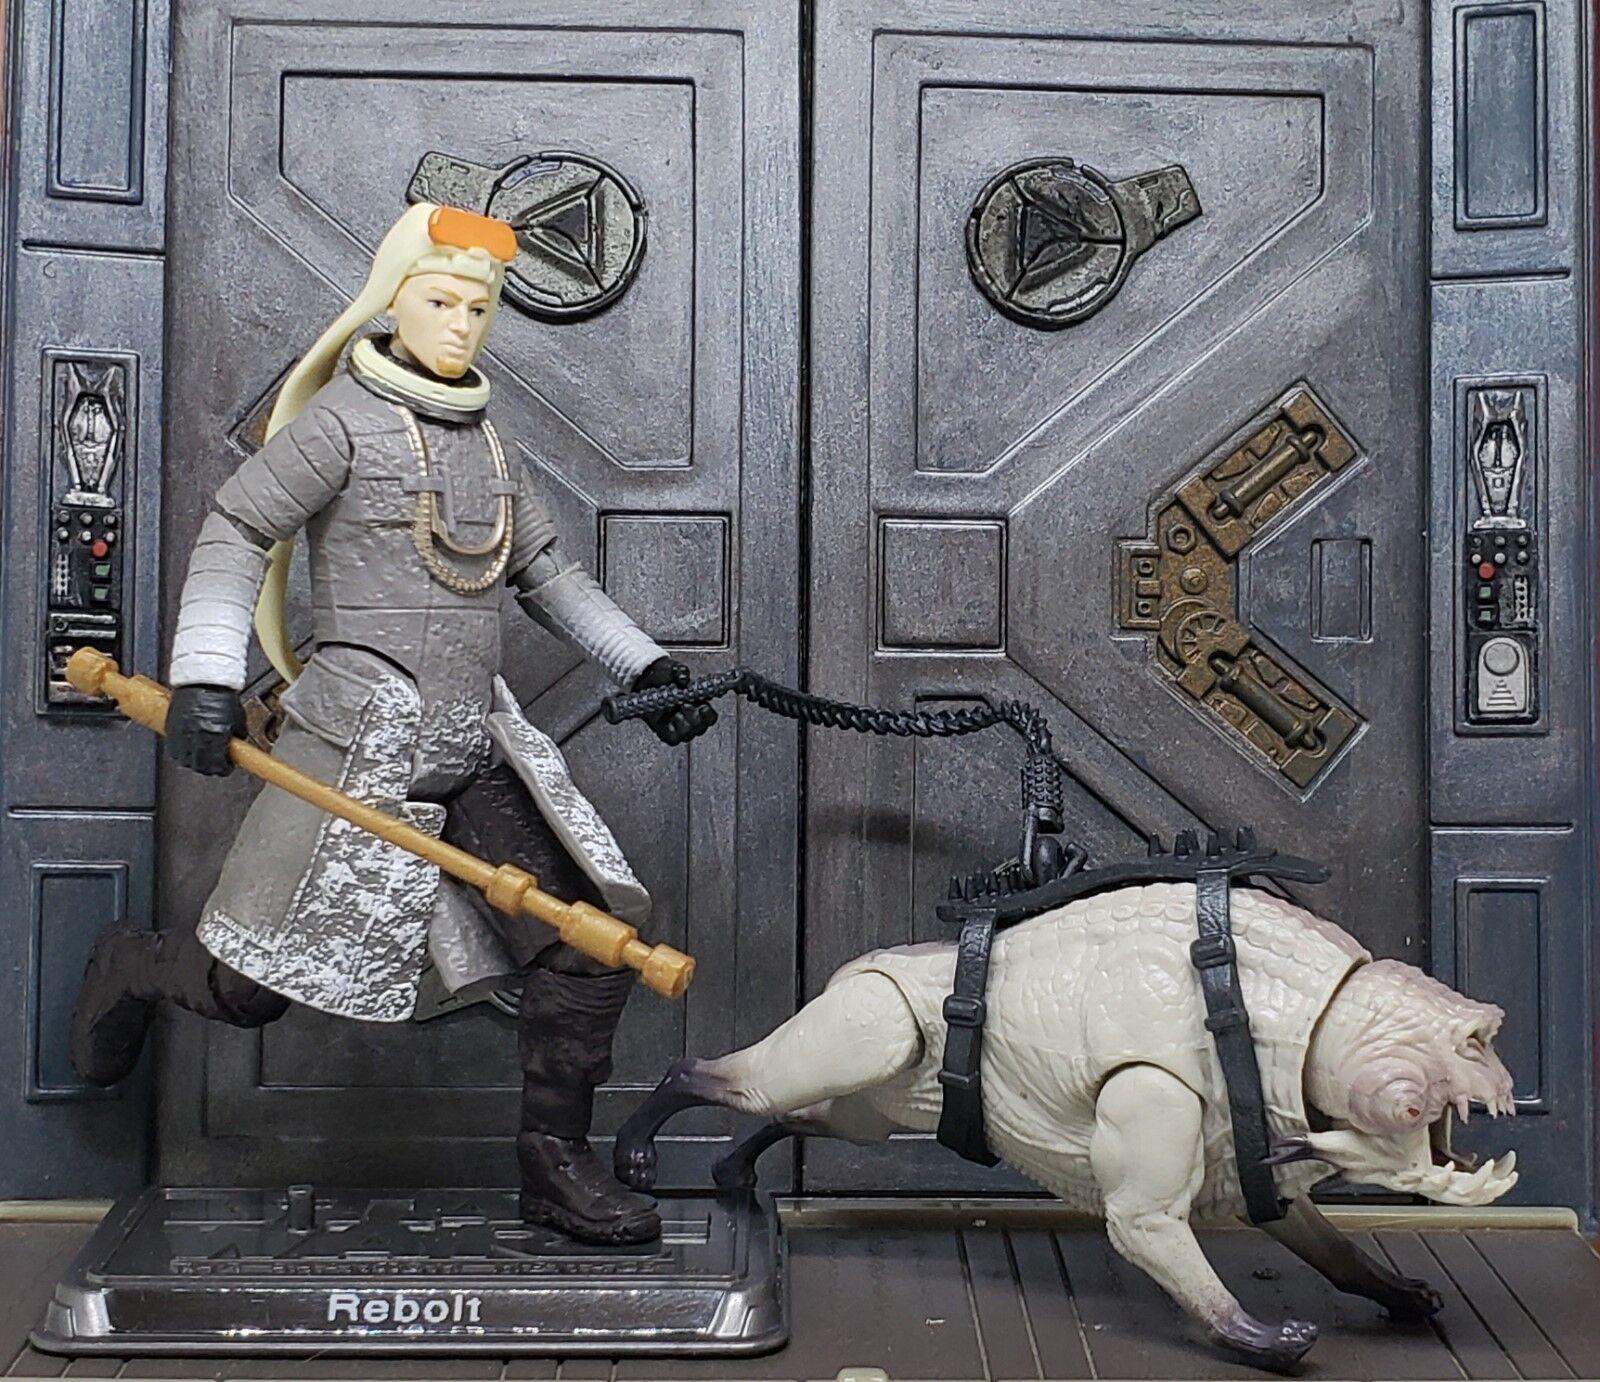 Star Wars Solo CUSTOM Rebolt & Corellian Hound 3.75 fig. More Articulate.2 weeks